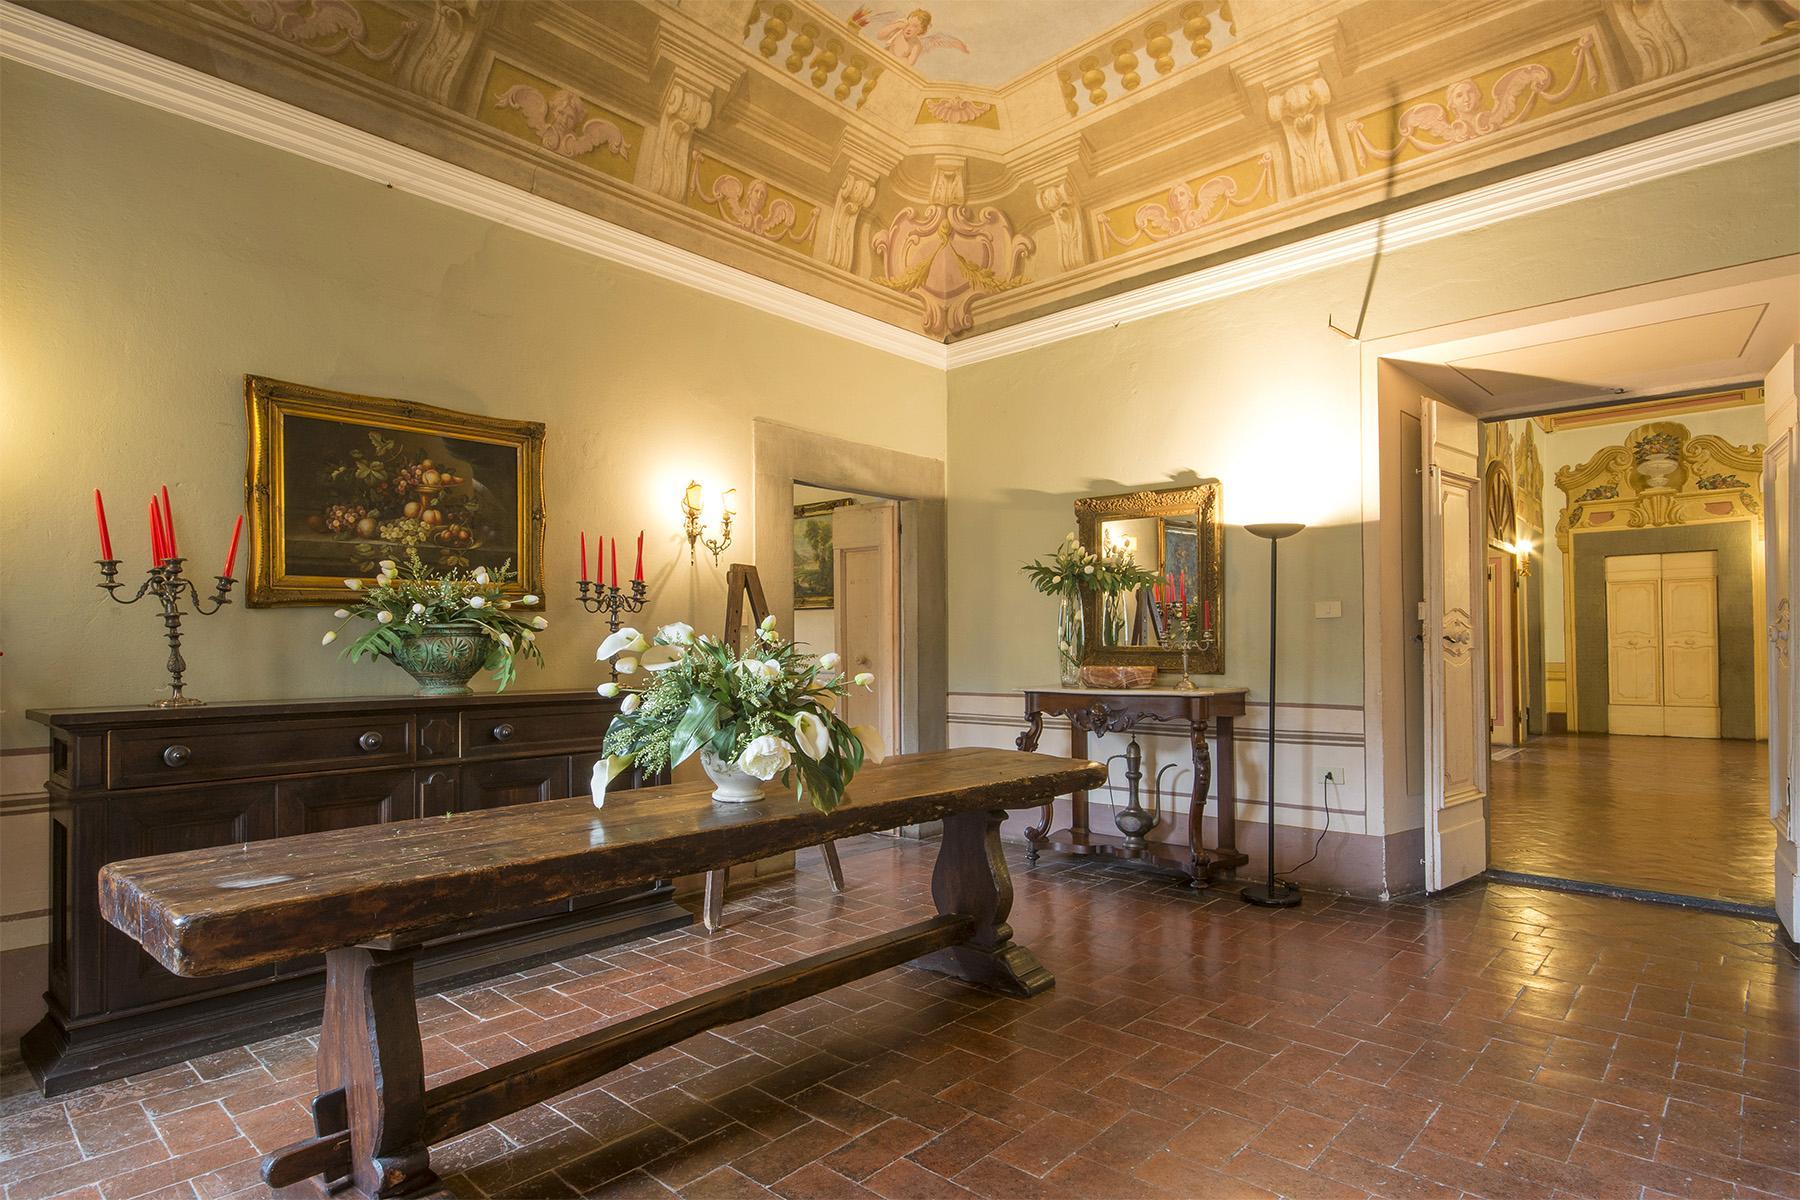 Wonderful Medicean Villa on the Pisan hills - 6